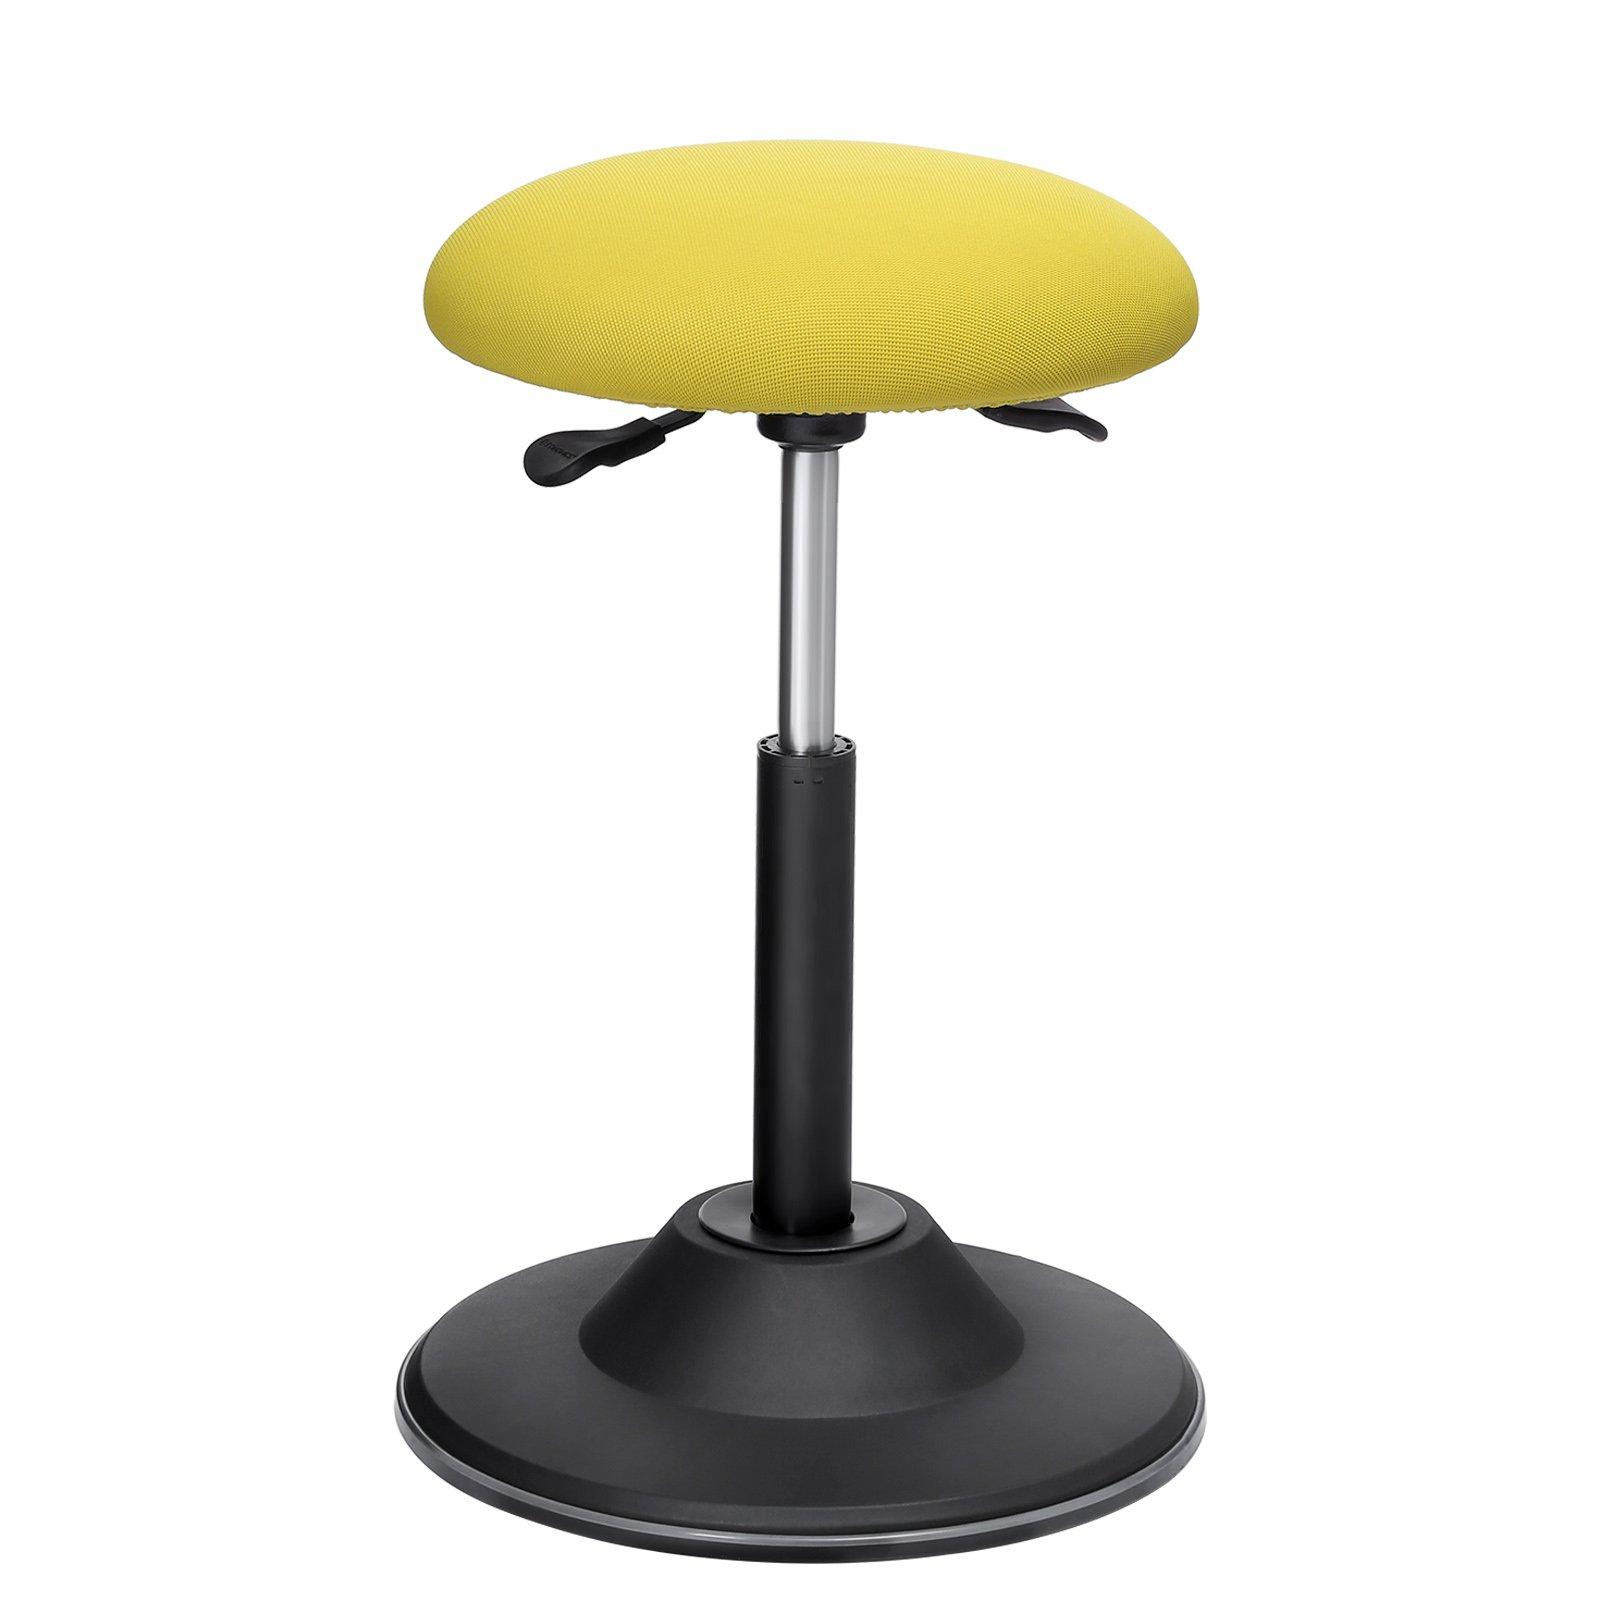 SONGMICS Standing Desk Chair, Adjustable Height Ergonomic Standing Stool, 360° Swivel Sitting Balance Chair, Anti-Slip Bottom Pad, Sit-Stand Stool for Office Home School, Fabric Yellow UOSC01GN